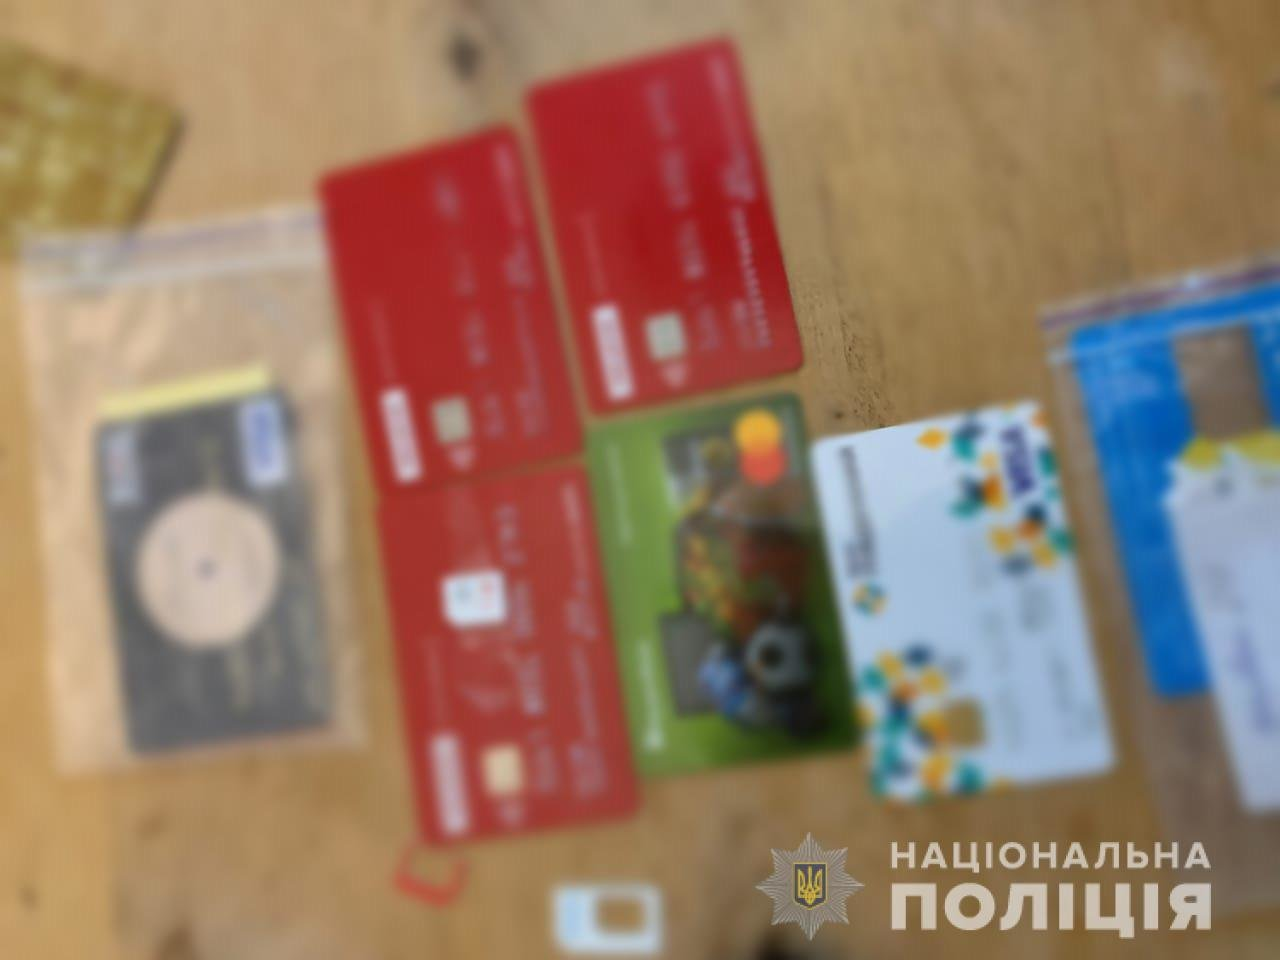 В Одессе онлайн-аферист обманул людей на 70 тысяч гривен, - ФОТО, фото-1